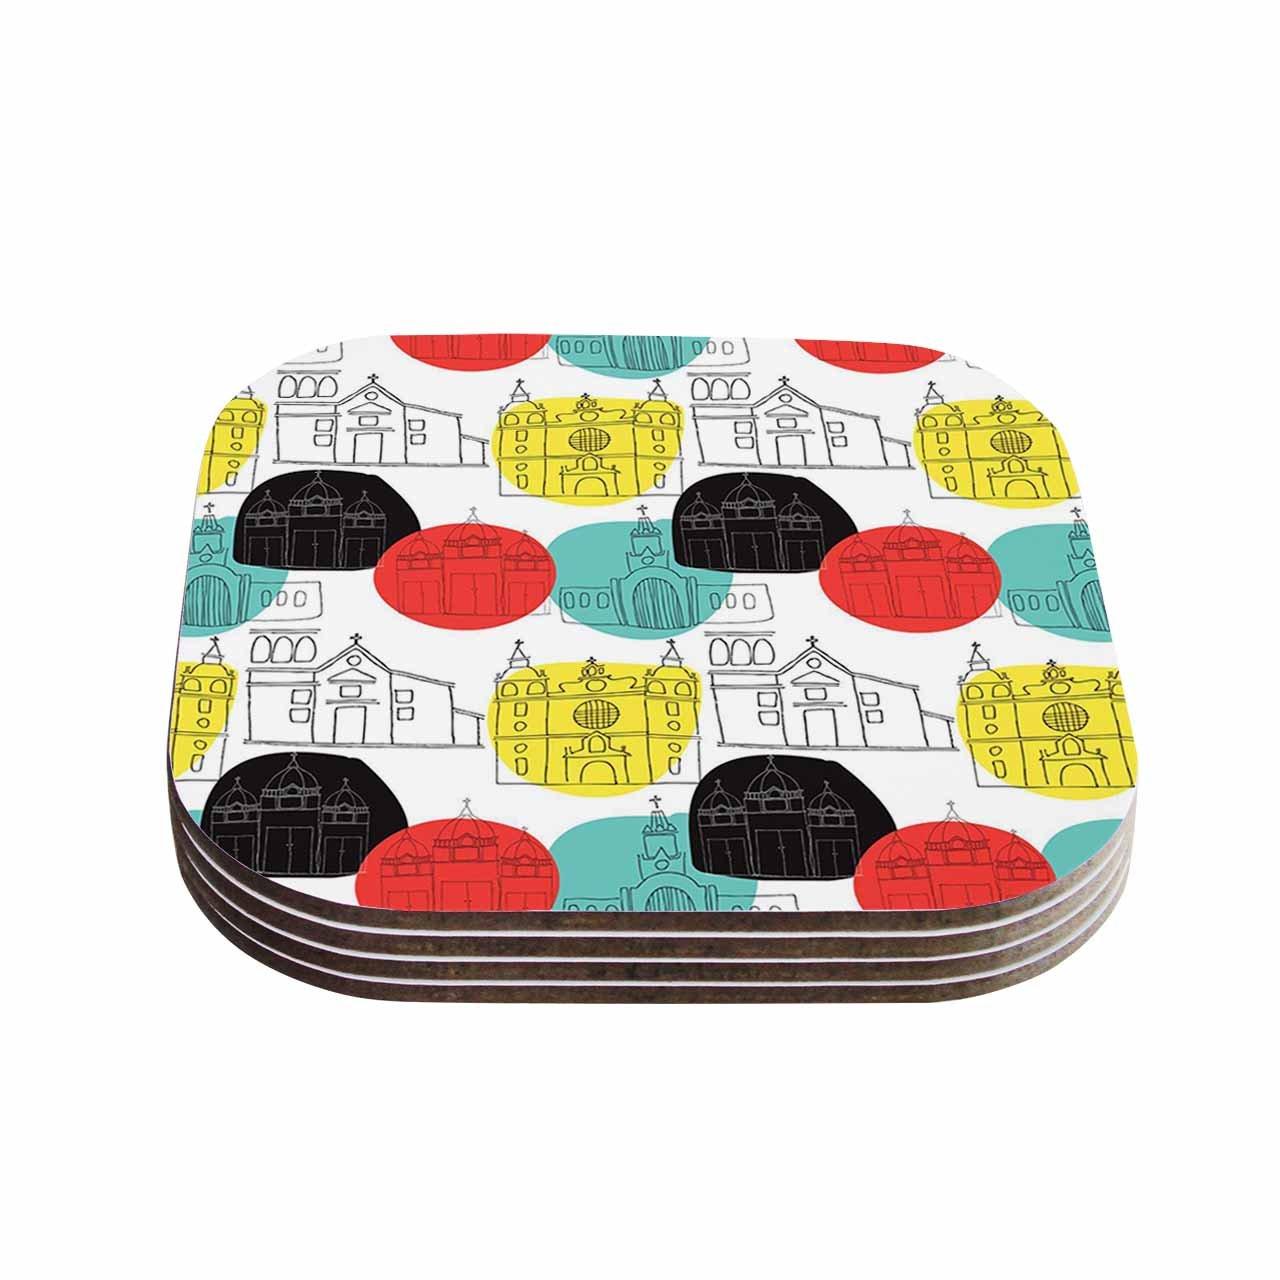 KESS InHouse MaJoBVCartagena Churches Teal Red Polkadot Coasters 4 x 4 Set of 4 Multicolor